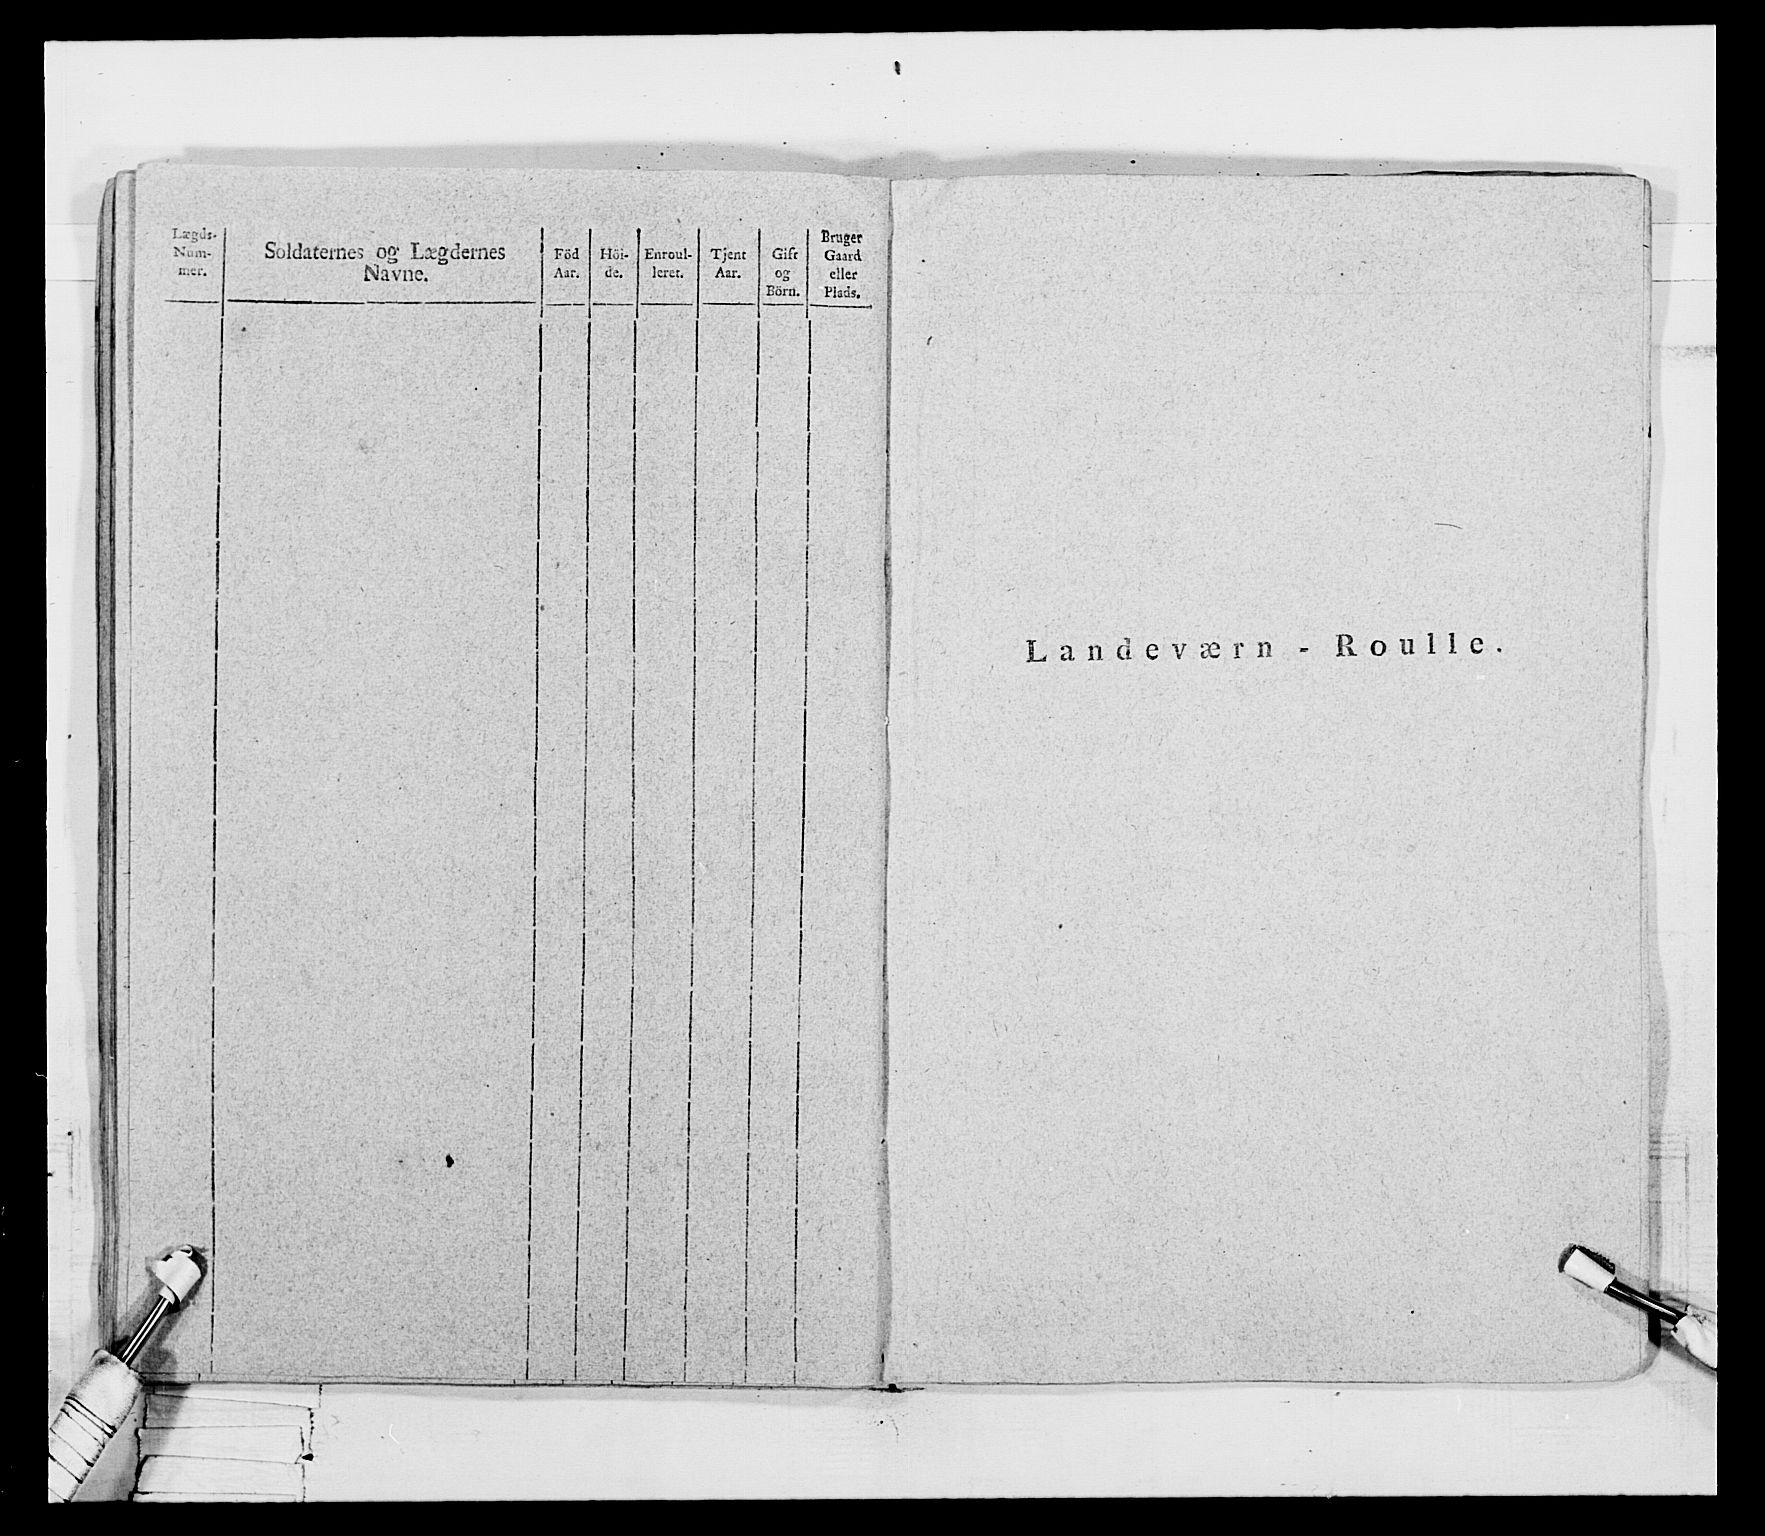 RA, Generalitets- og kommissariatskollegiet, Det kongelige norske kommissariatskollegium, E/Eh/L0069: Opplandske gevorbne infanteriregiment, 1810-1818, s. 37